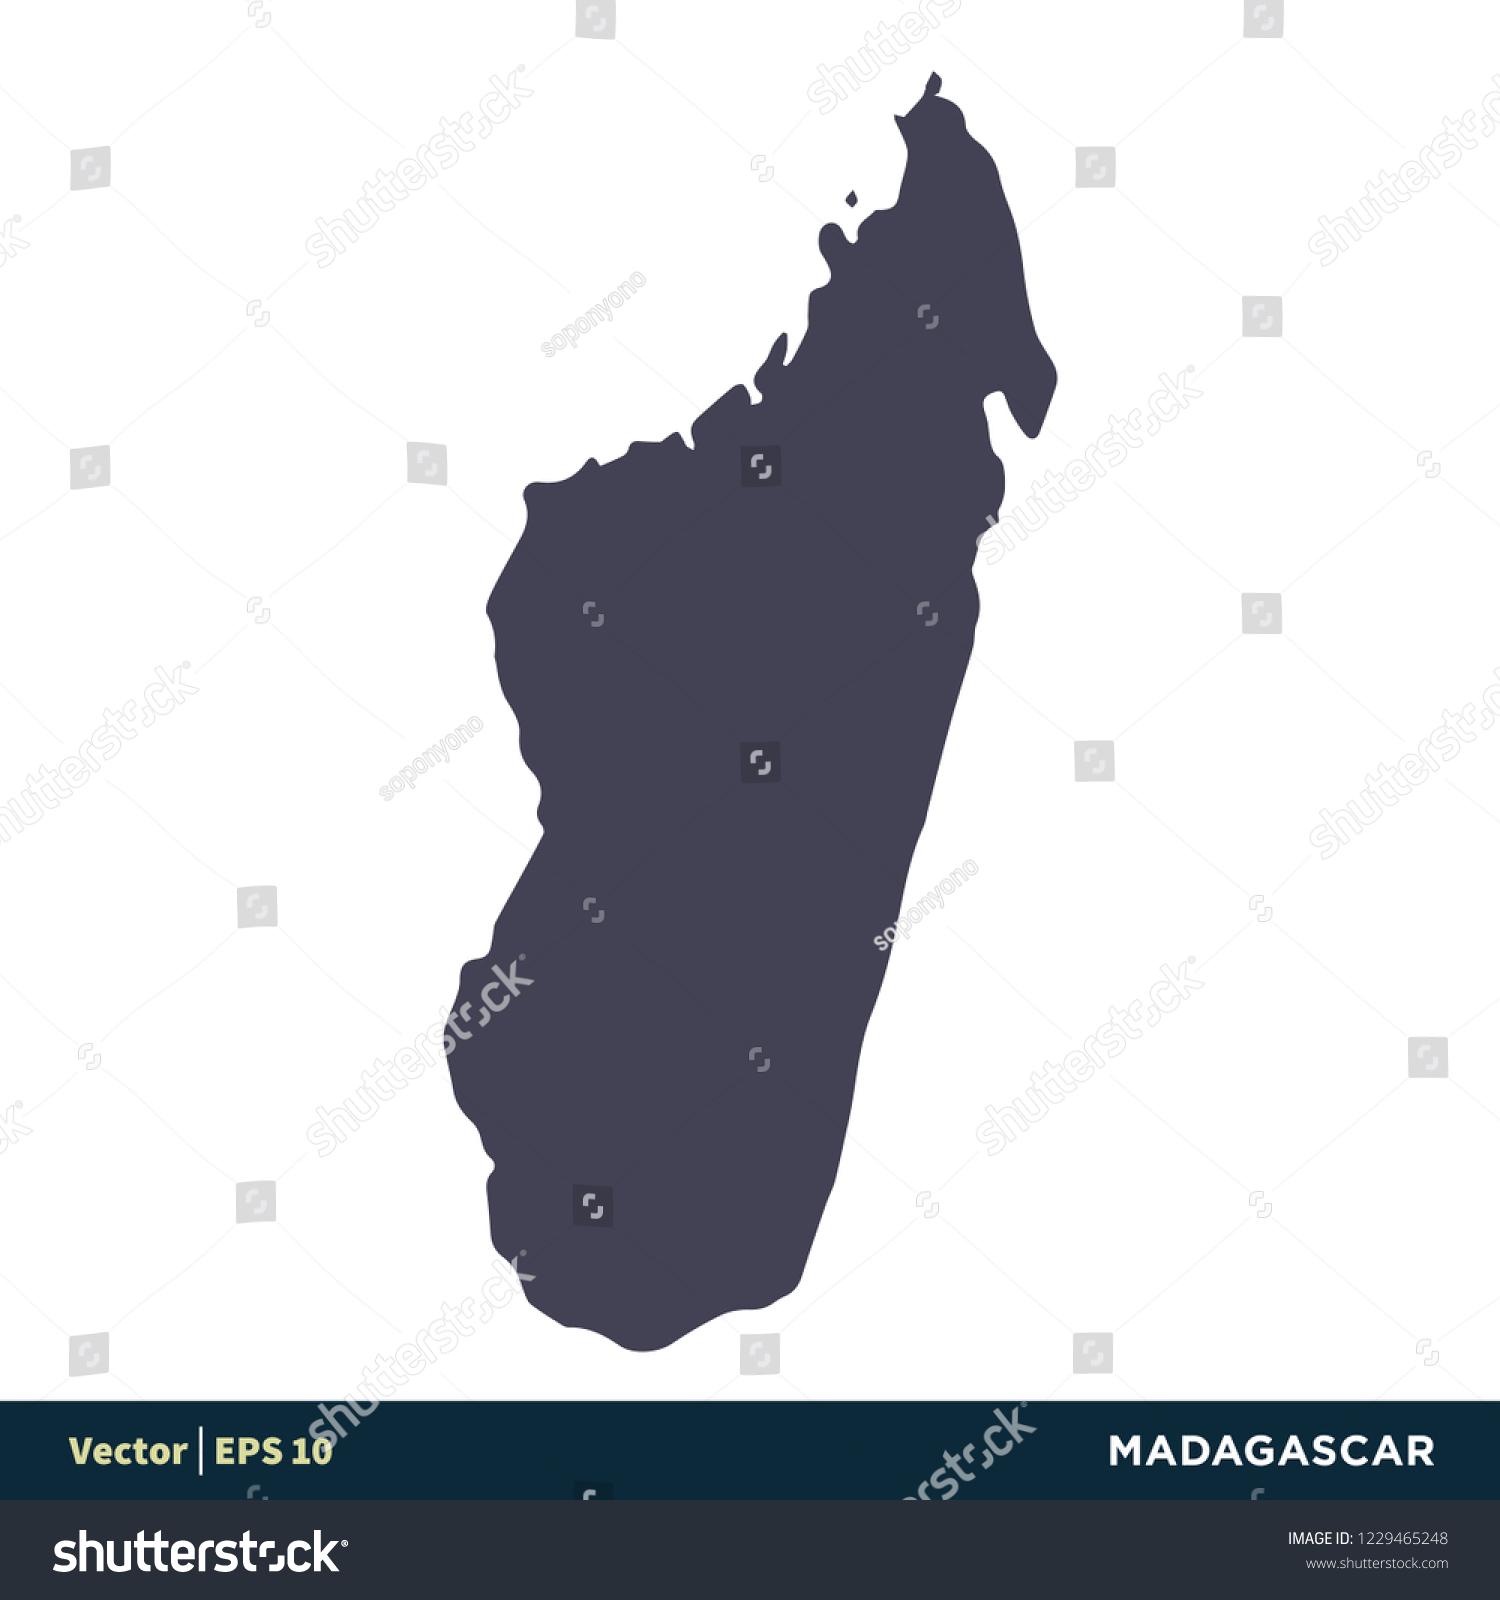 Madagascar Africa Countries Map Icon Vector Stock Vector Royalty